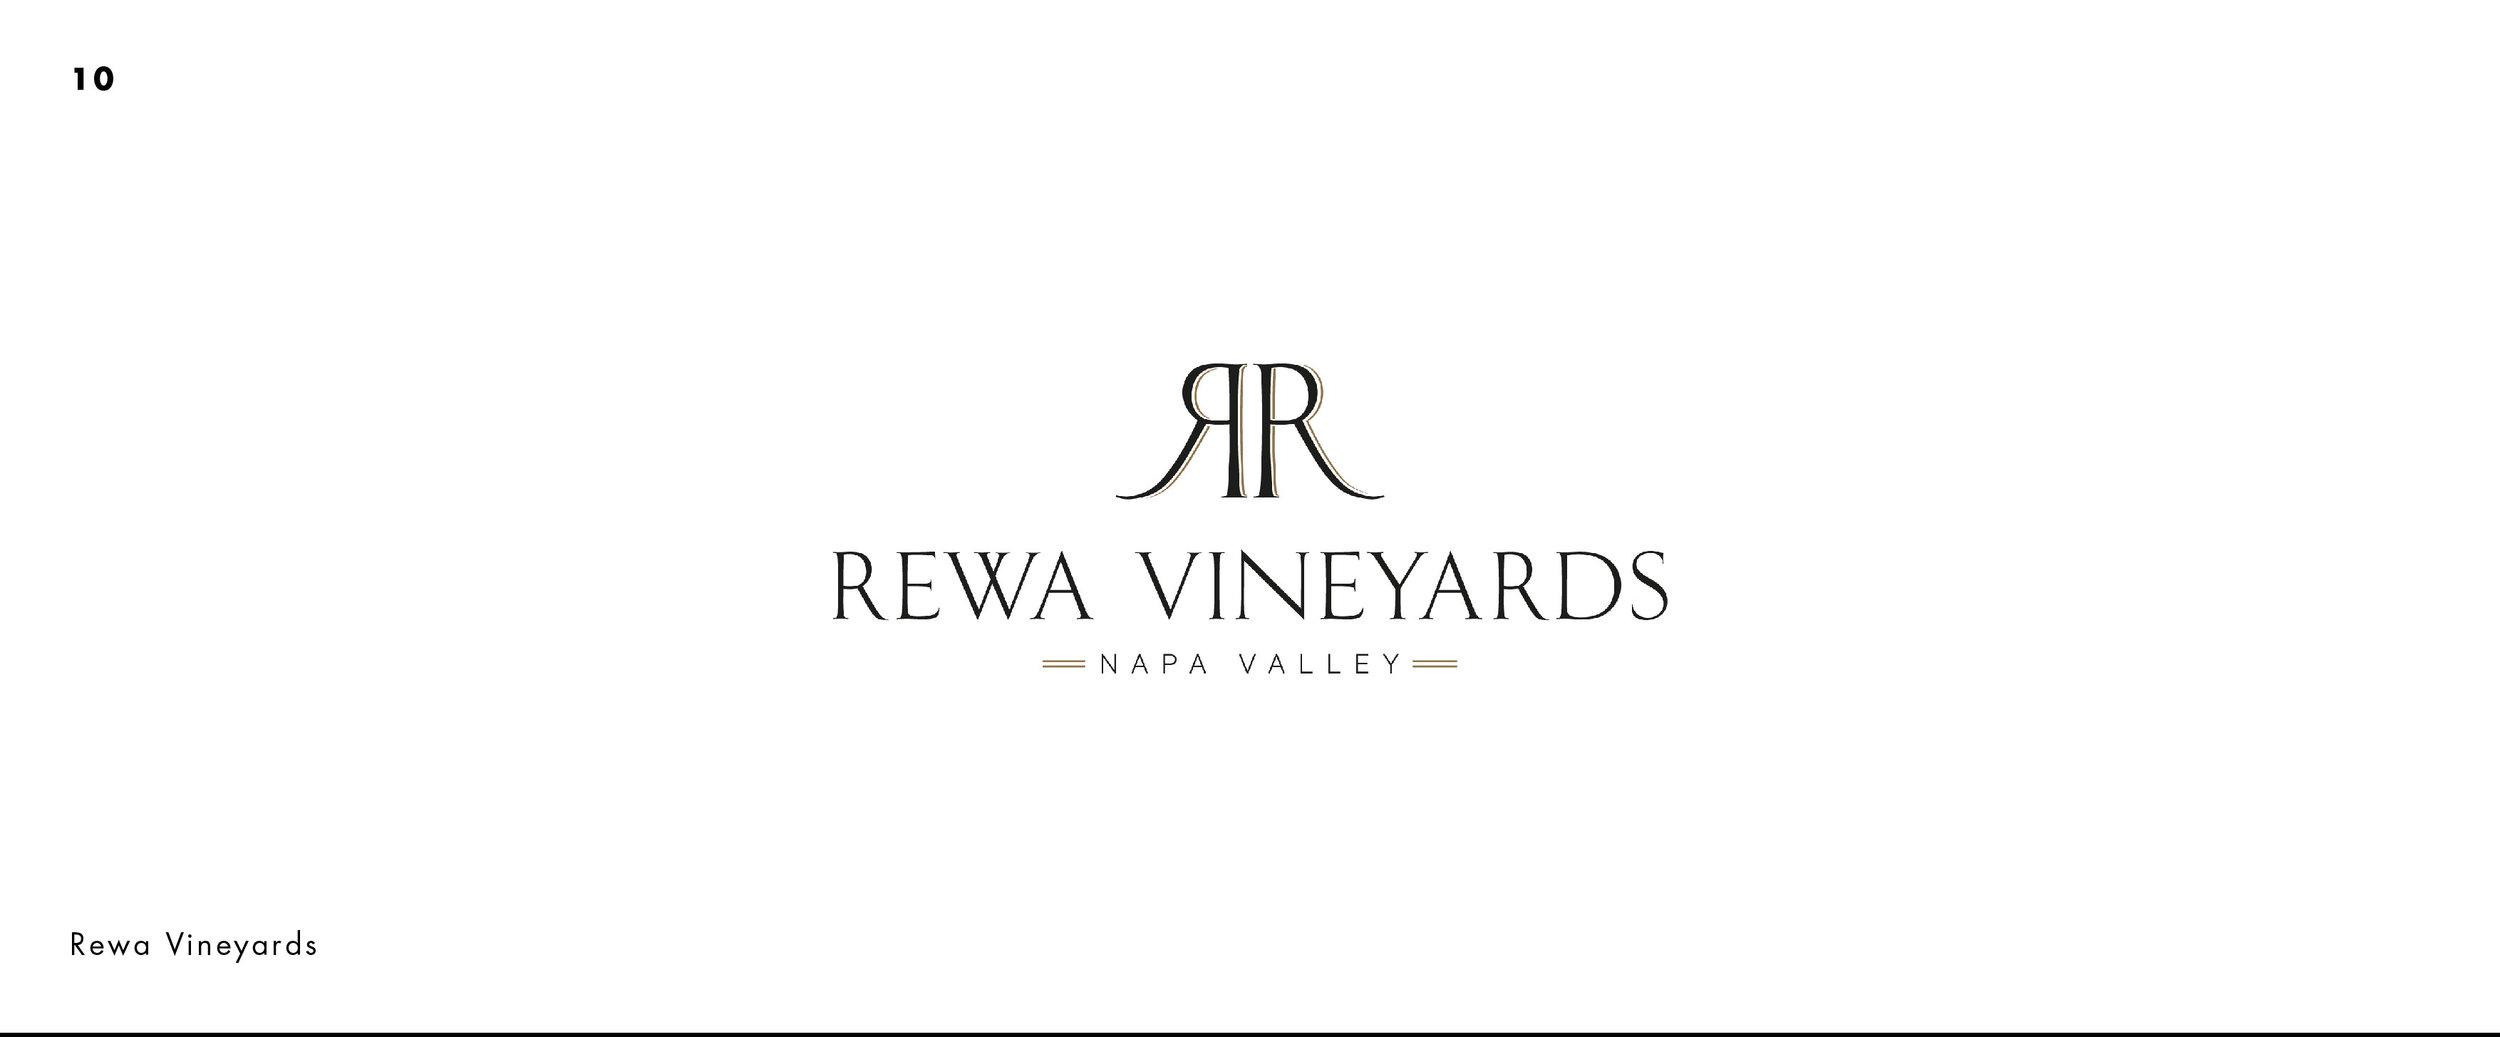 Rewa Vineyards.jpg